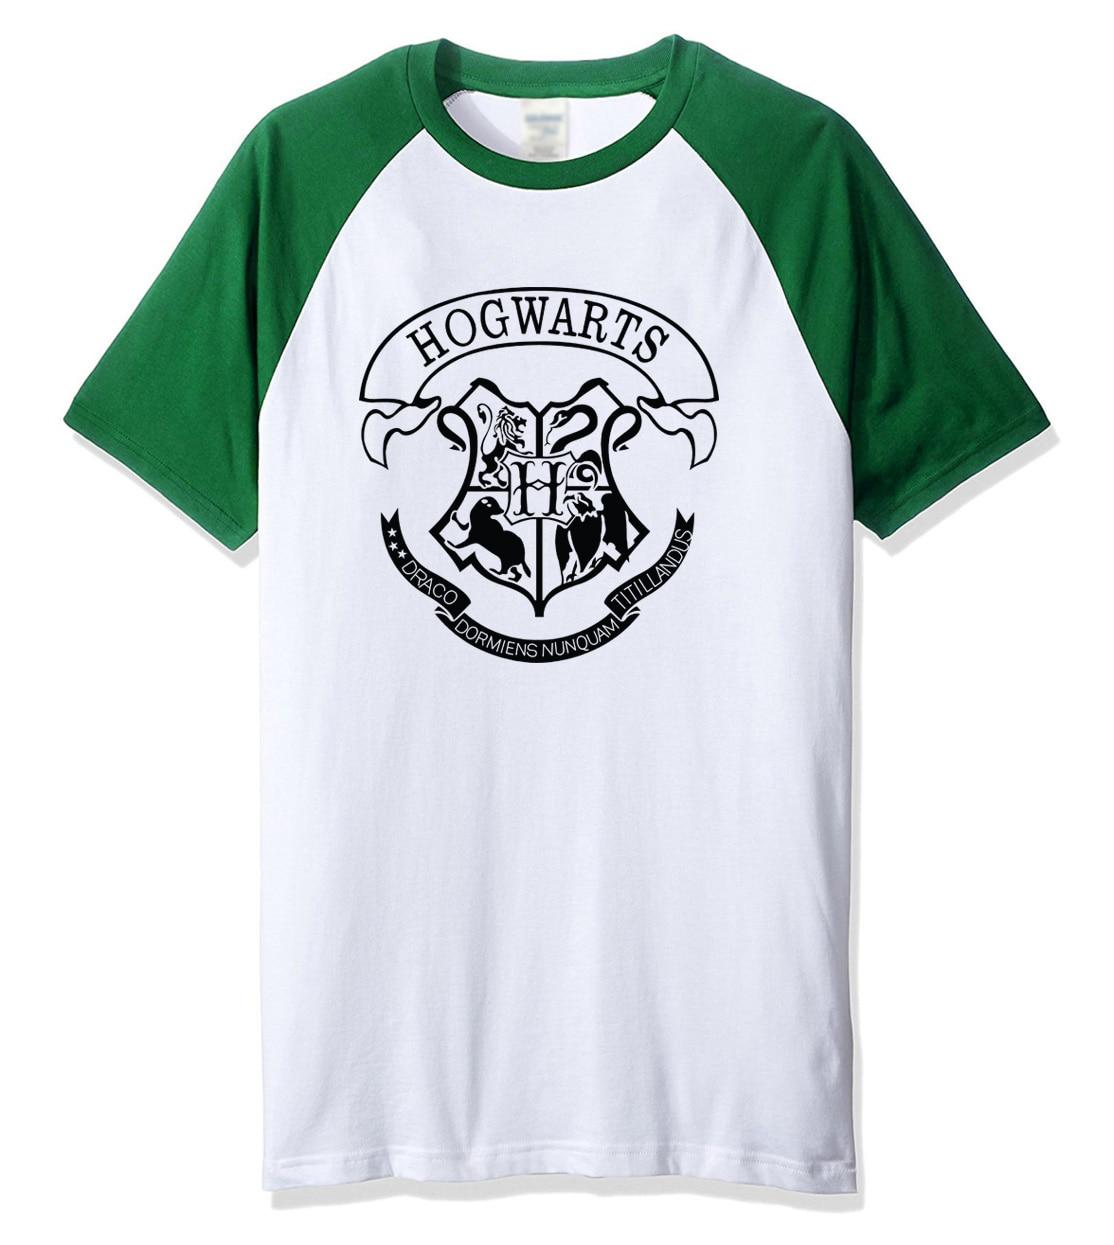 2019 summer   t     shirt   men short sleeve cotton O-neck funny   t     shirts   Hogwarts letter print men's sportswear raglan   t  -  shirt   tops tee